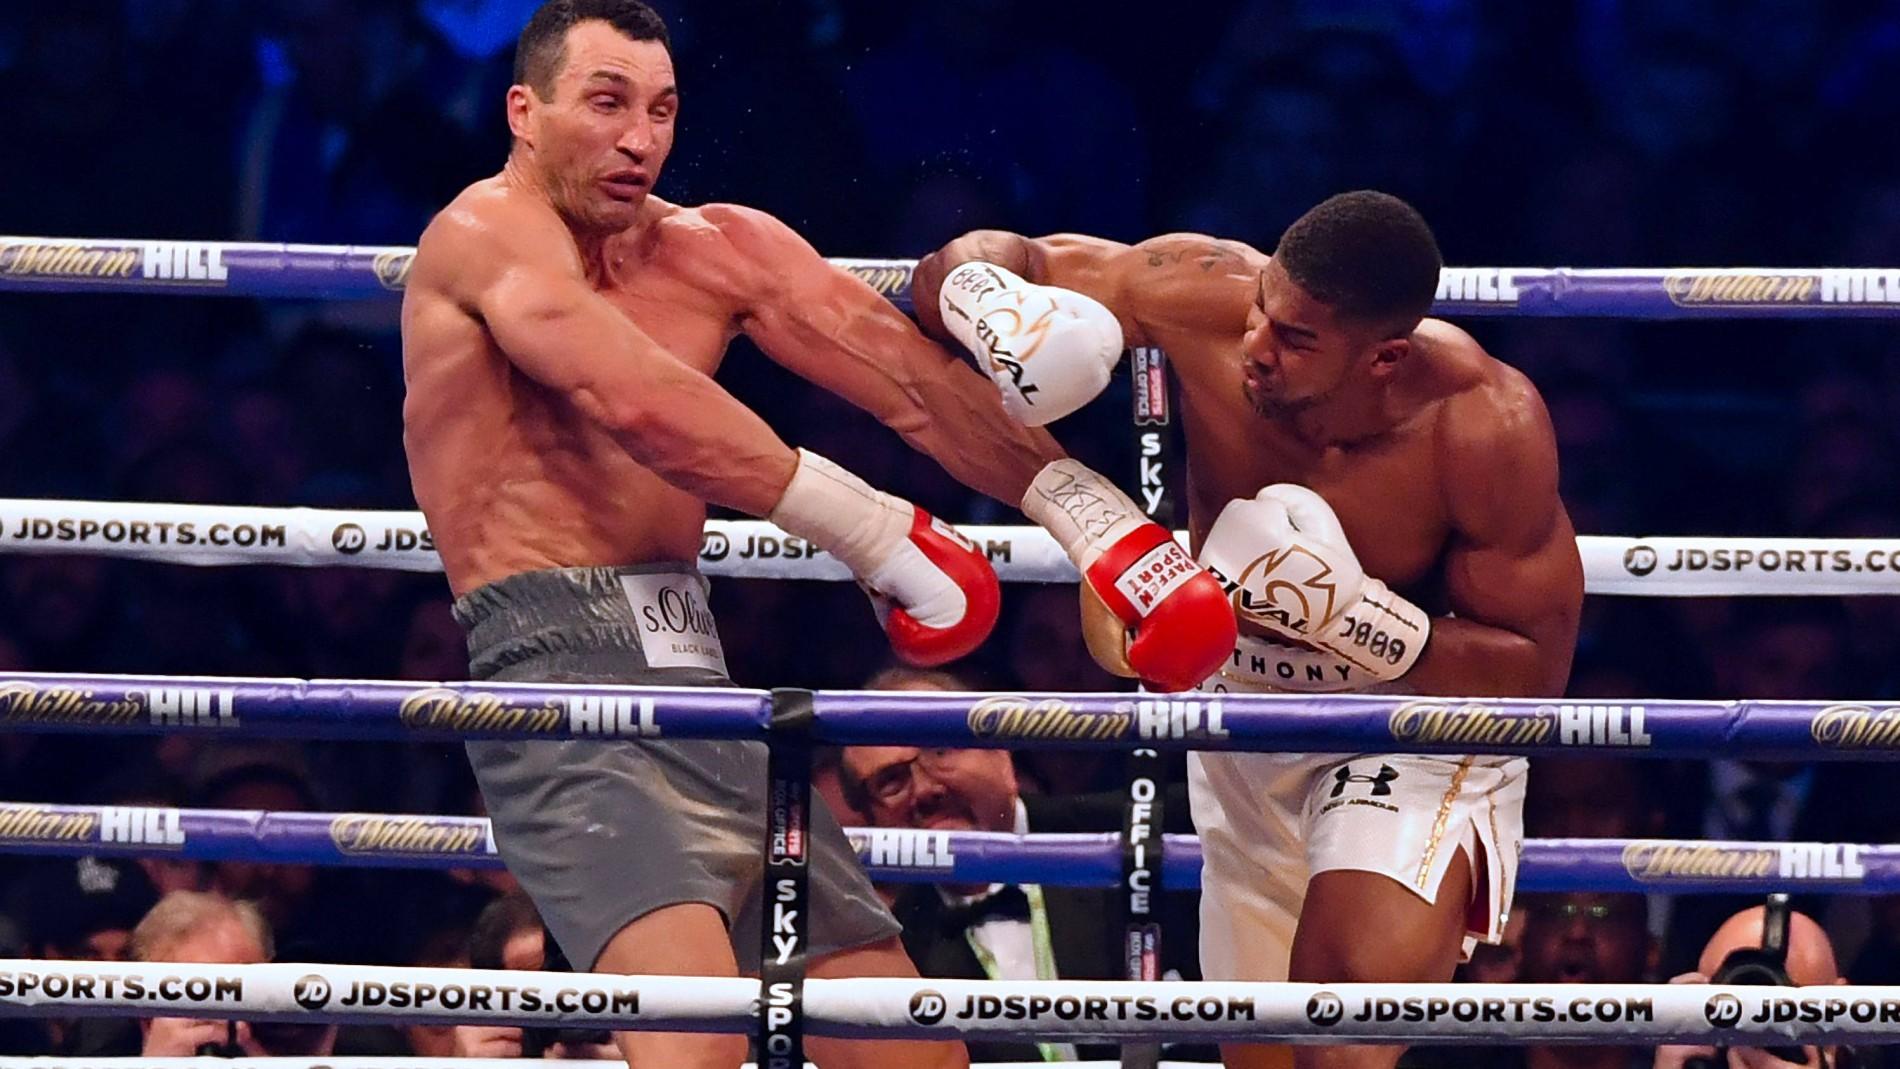 Wladimir Klitschko Verliert Box WM Kampf Gegen Anthony Joshua